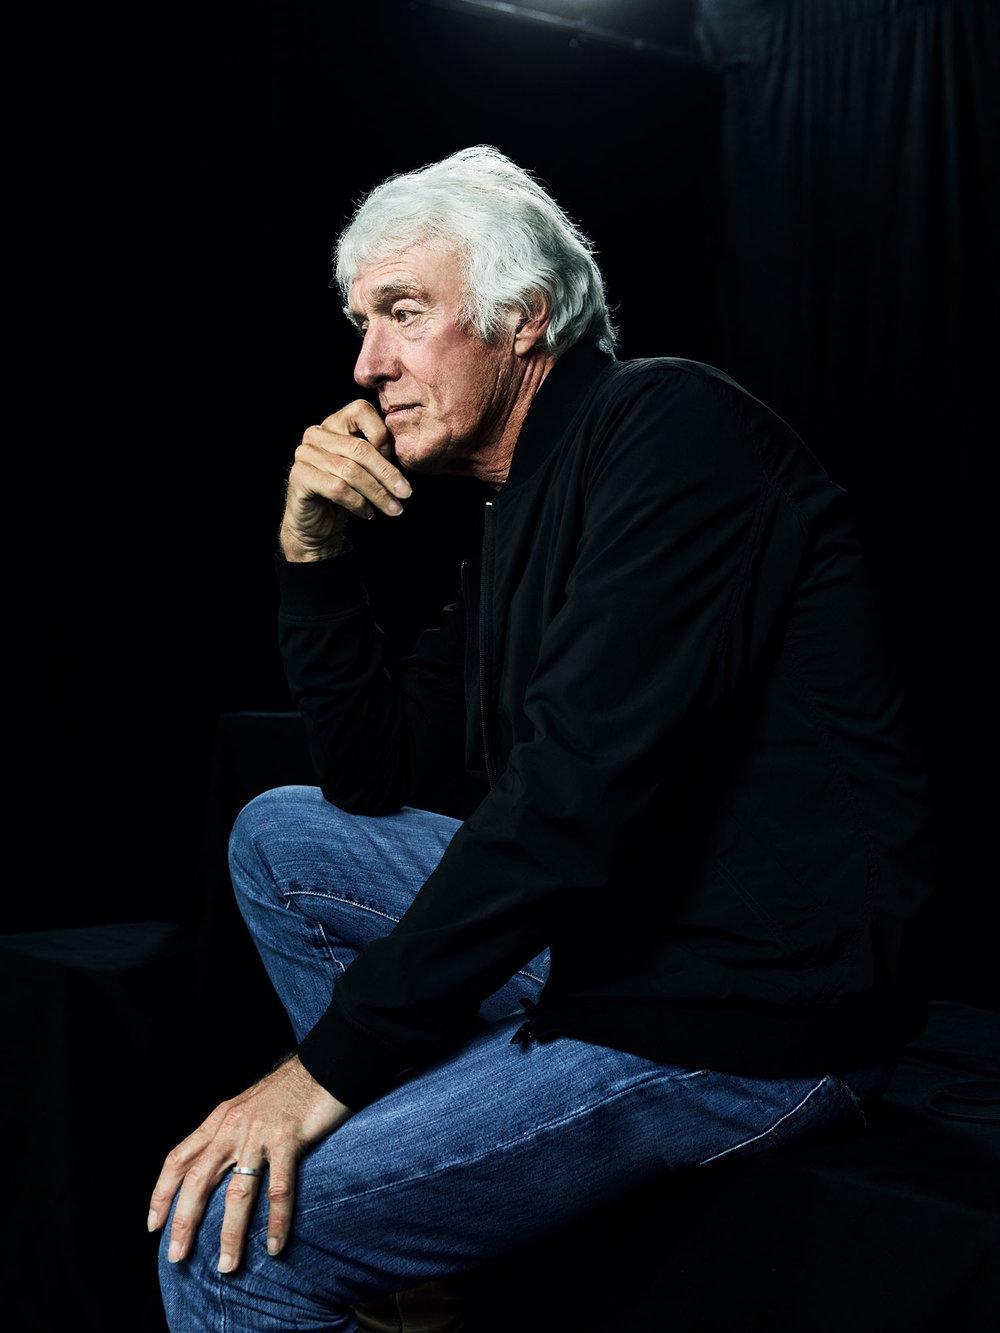 Roger Deakins, Cinematographer